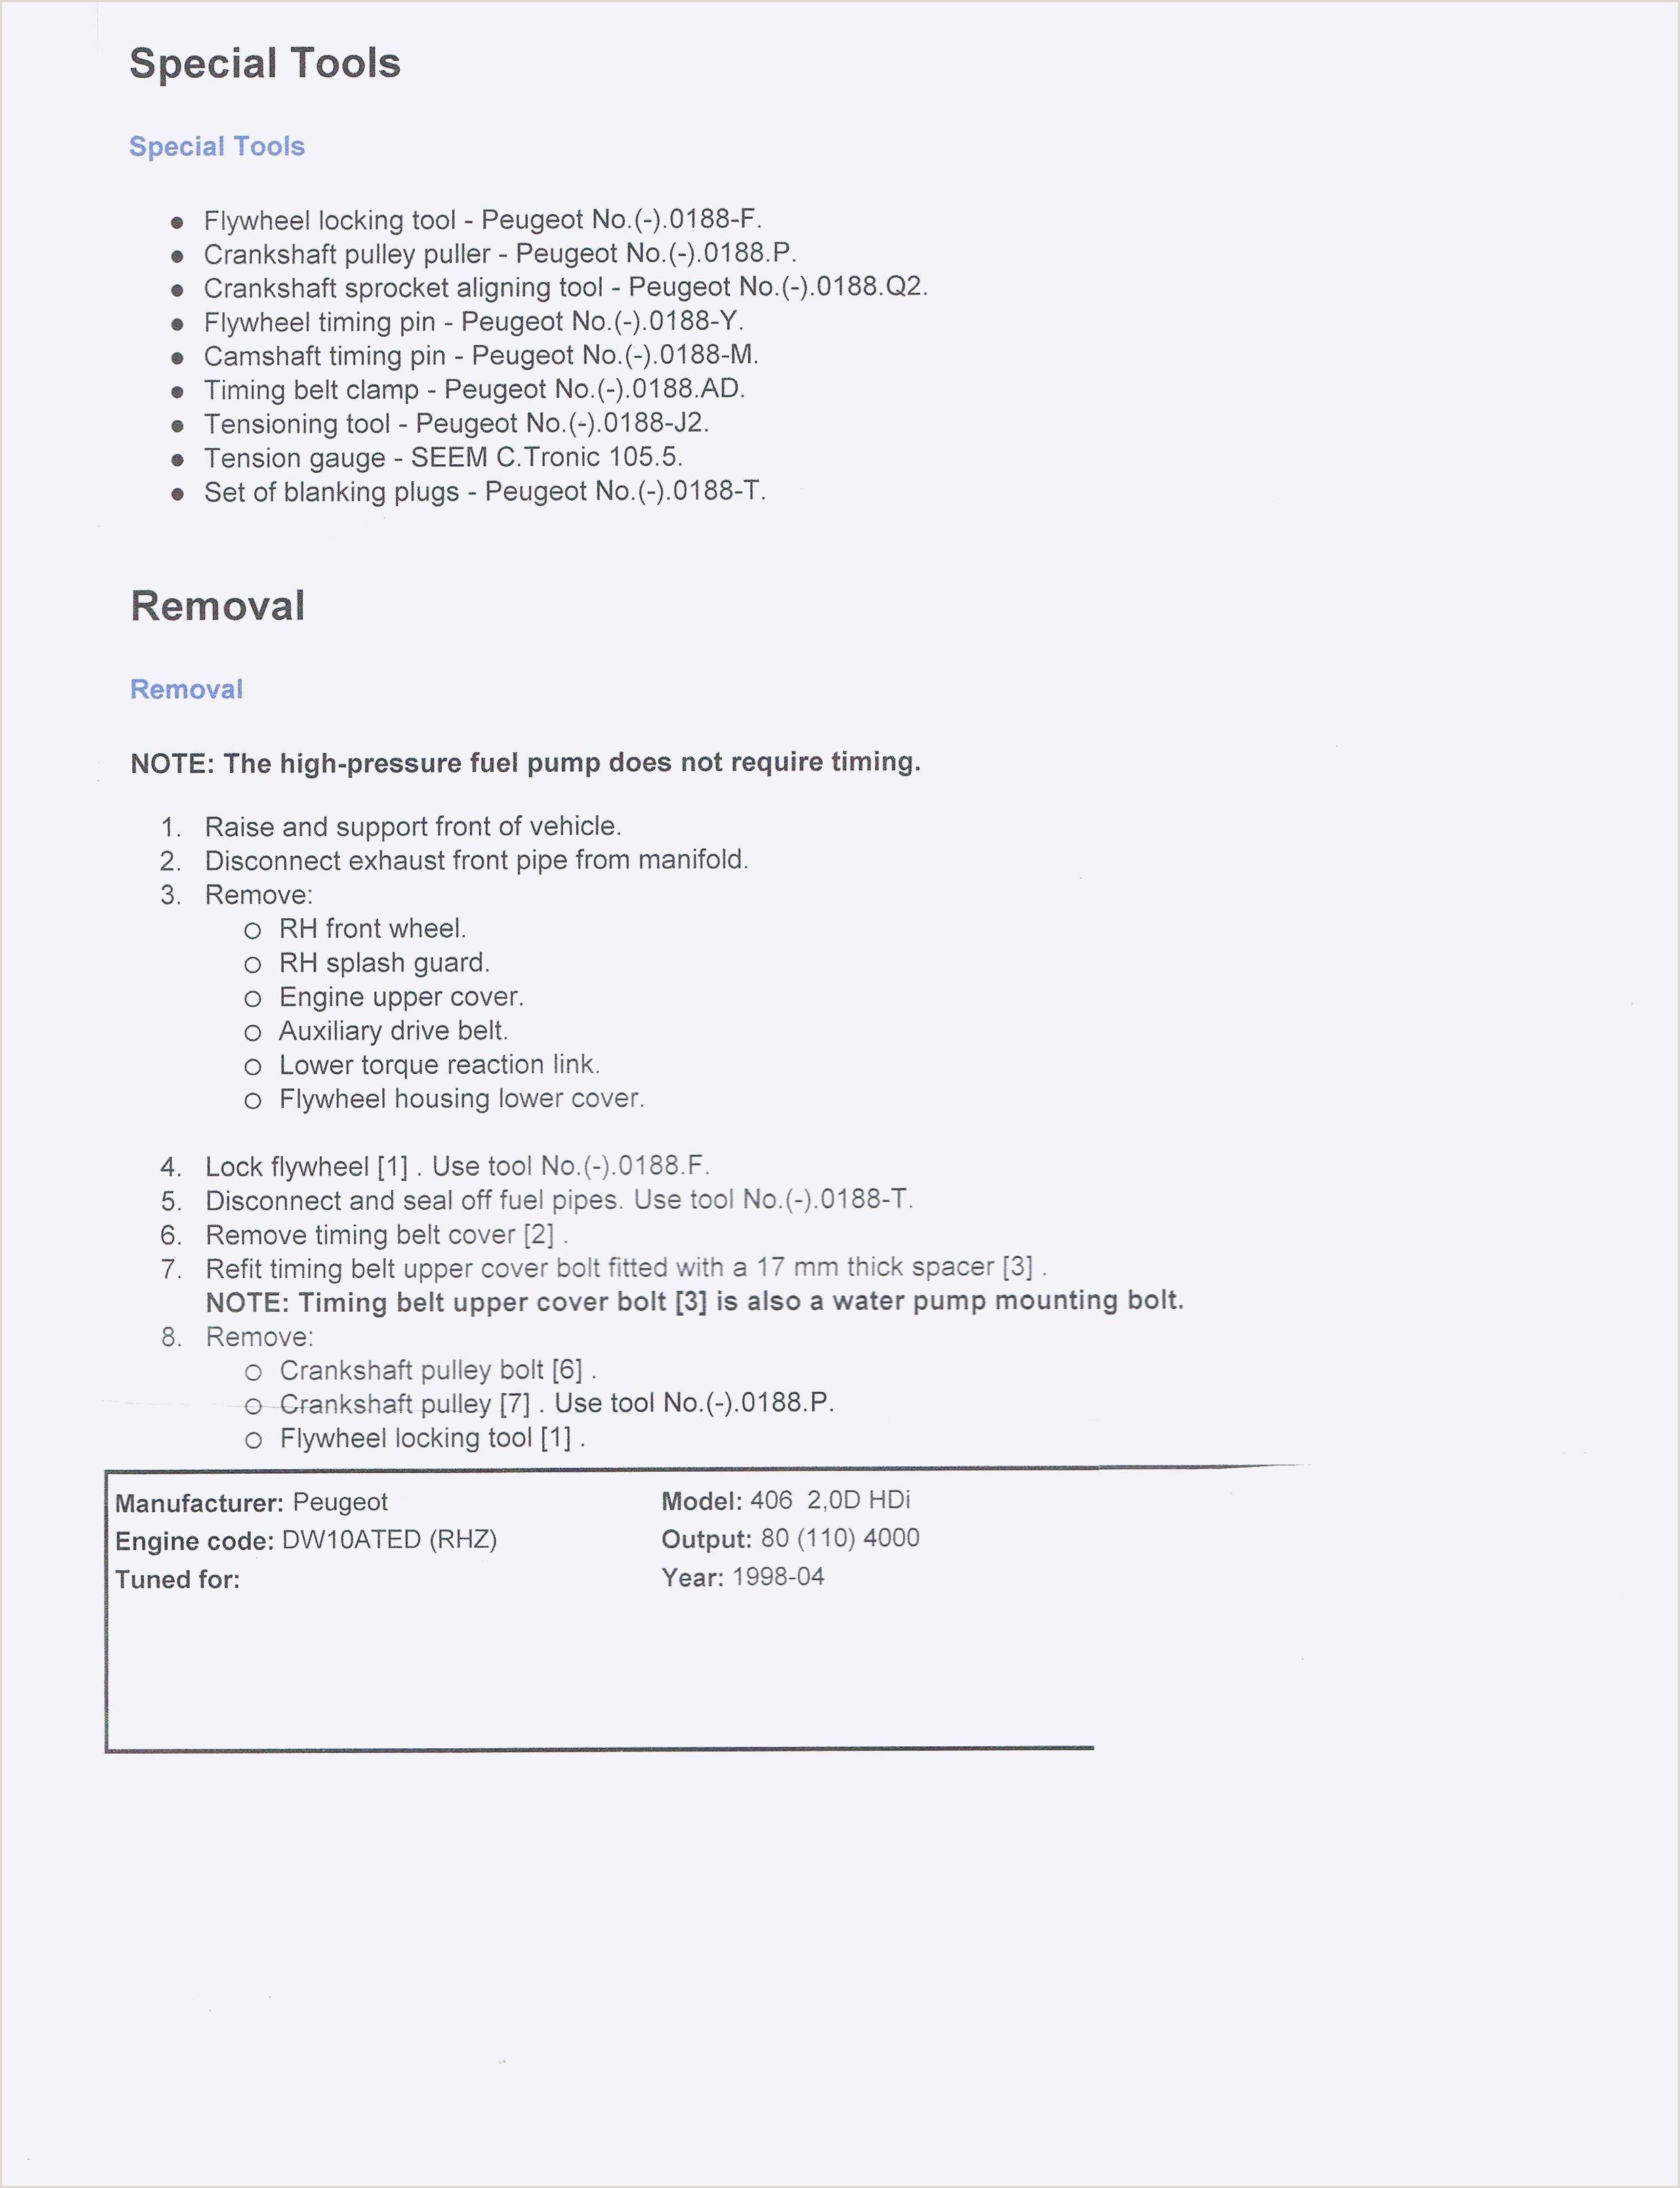 Lebenslauf Muster Manager Lebenslauf Muster Vorlage 11 Manager 11 15